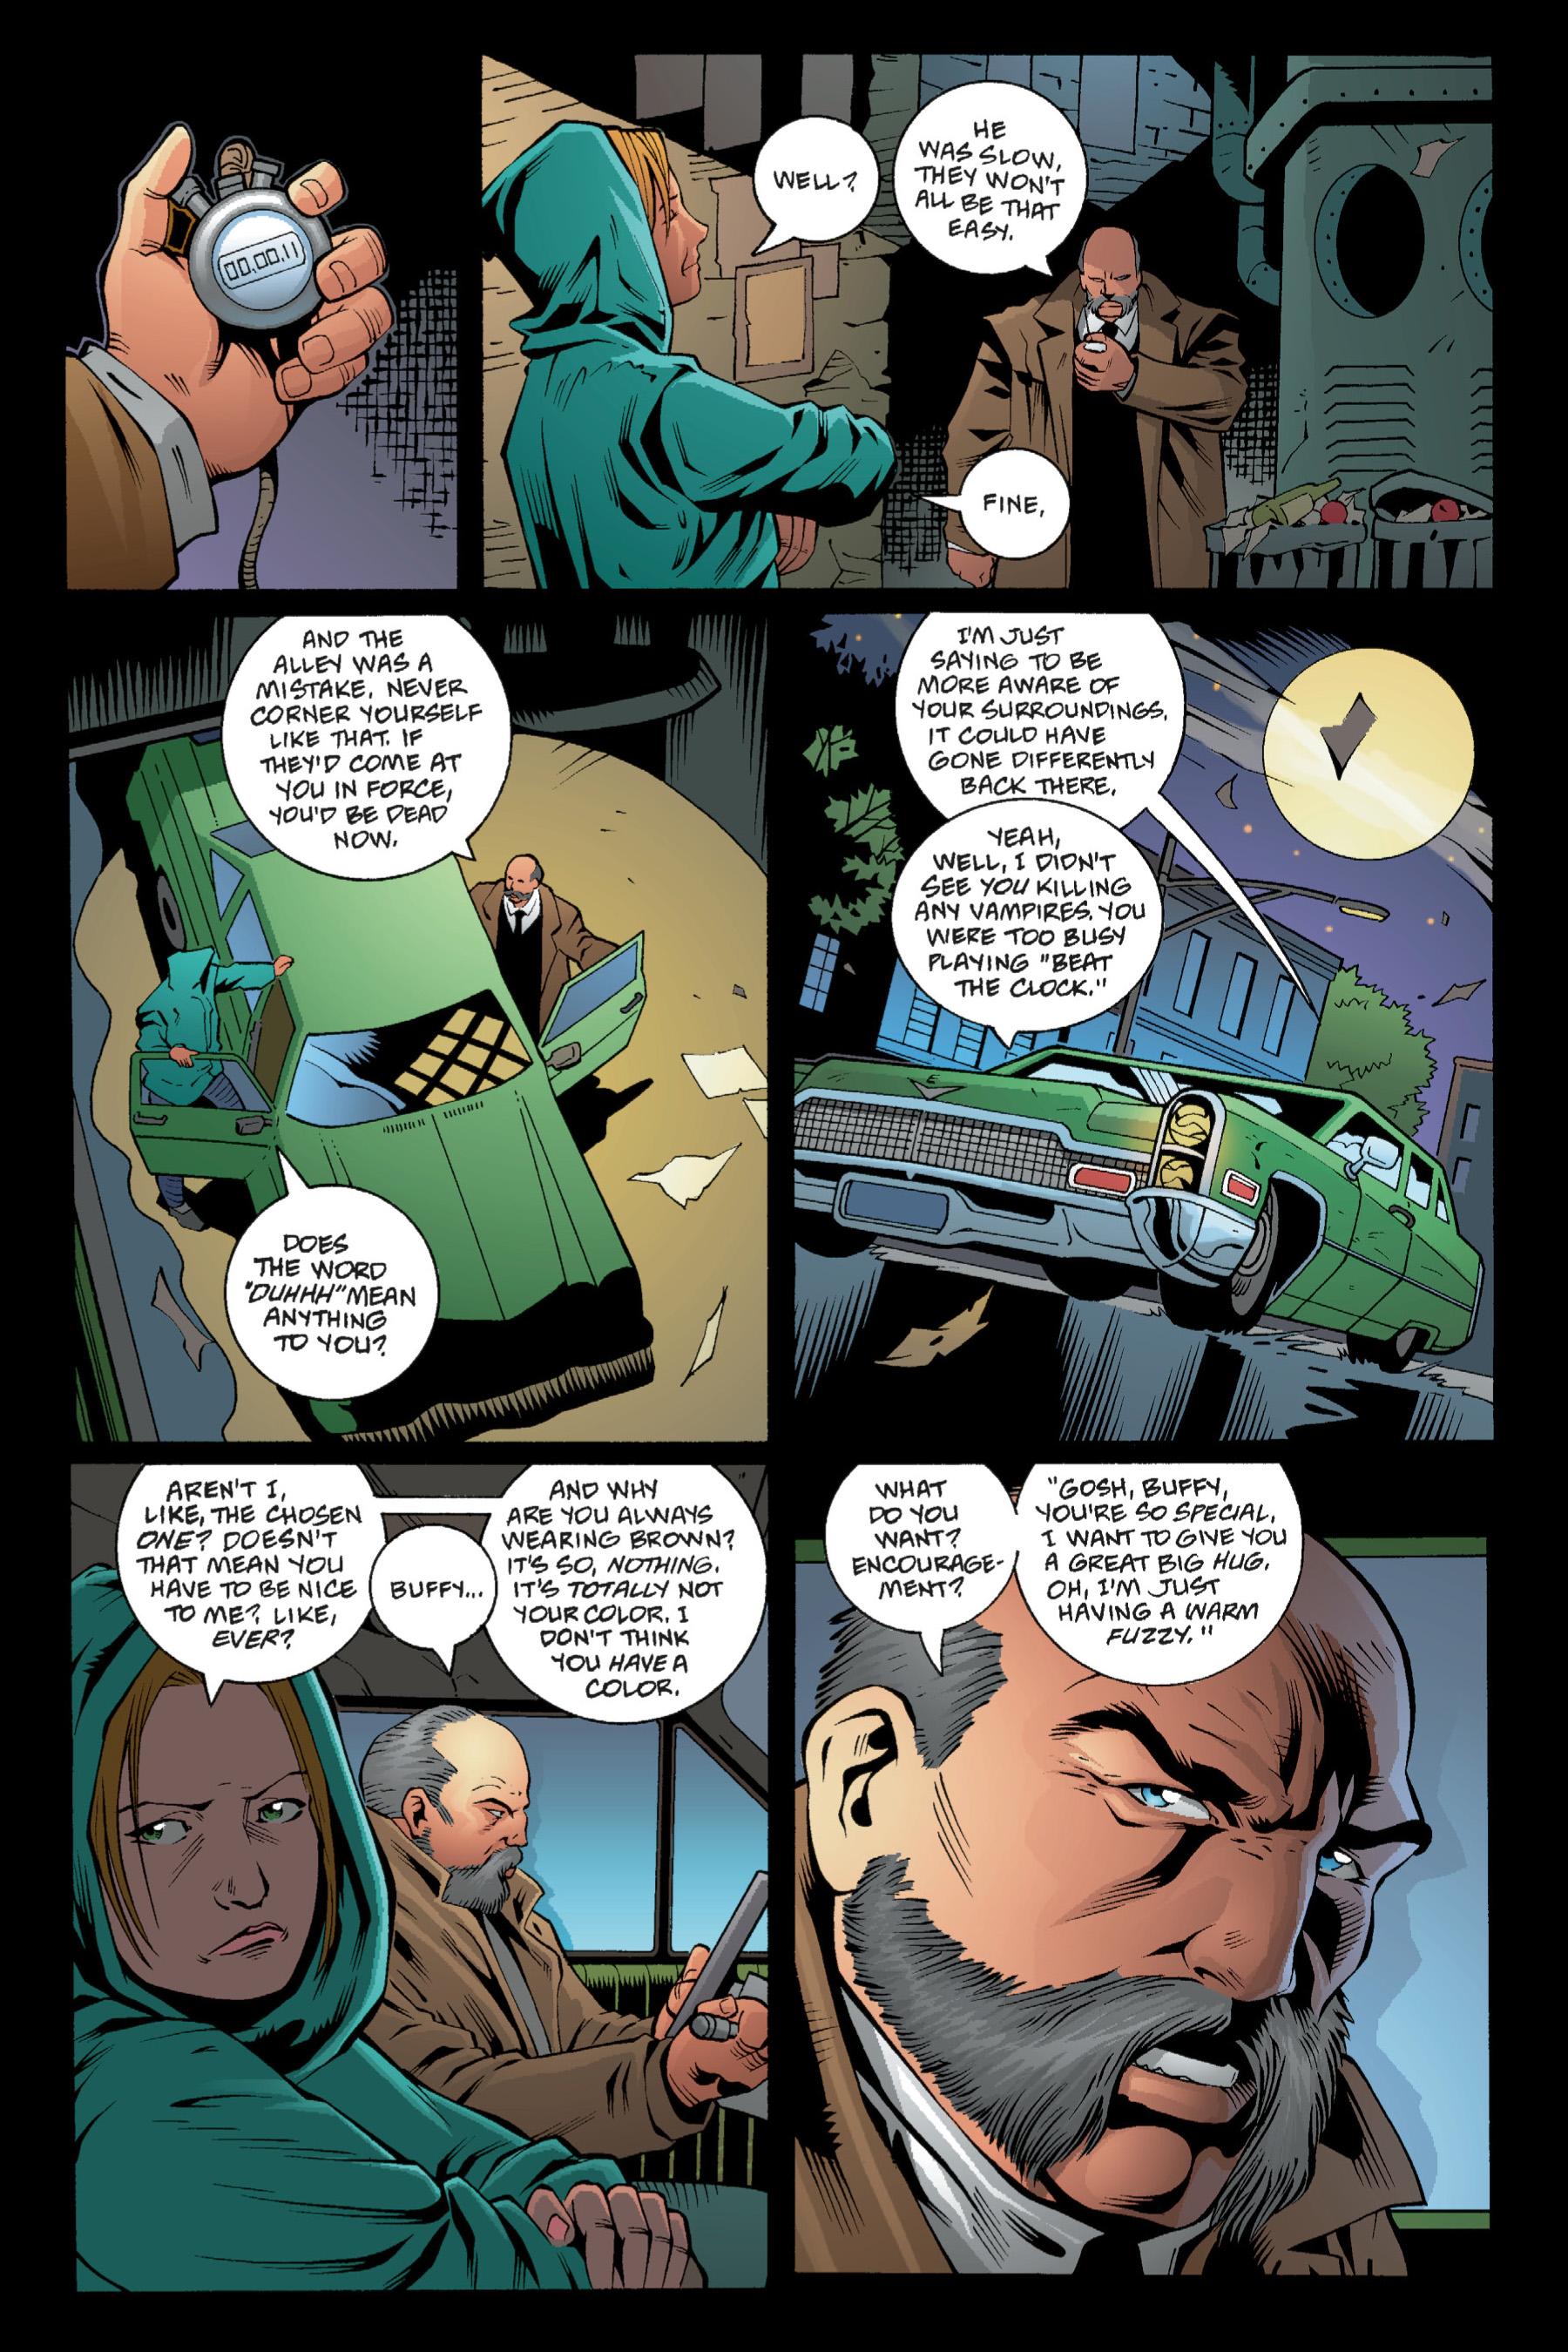 Read online Buffy the Vampire Slayer: Omnibus comic -  Issue # TPB 1 - 70